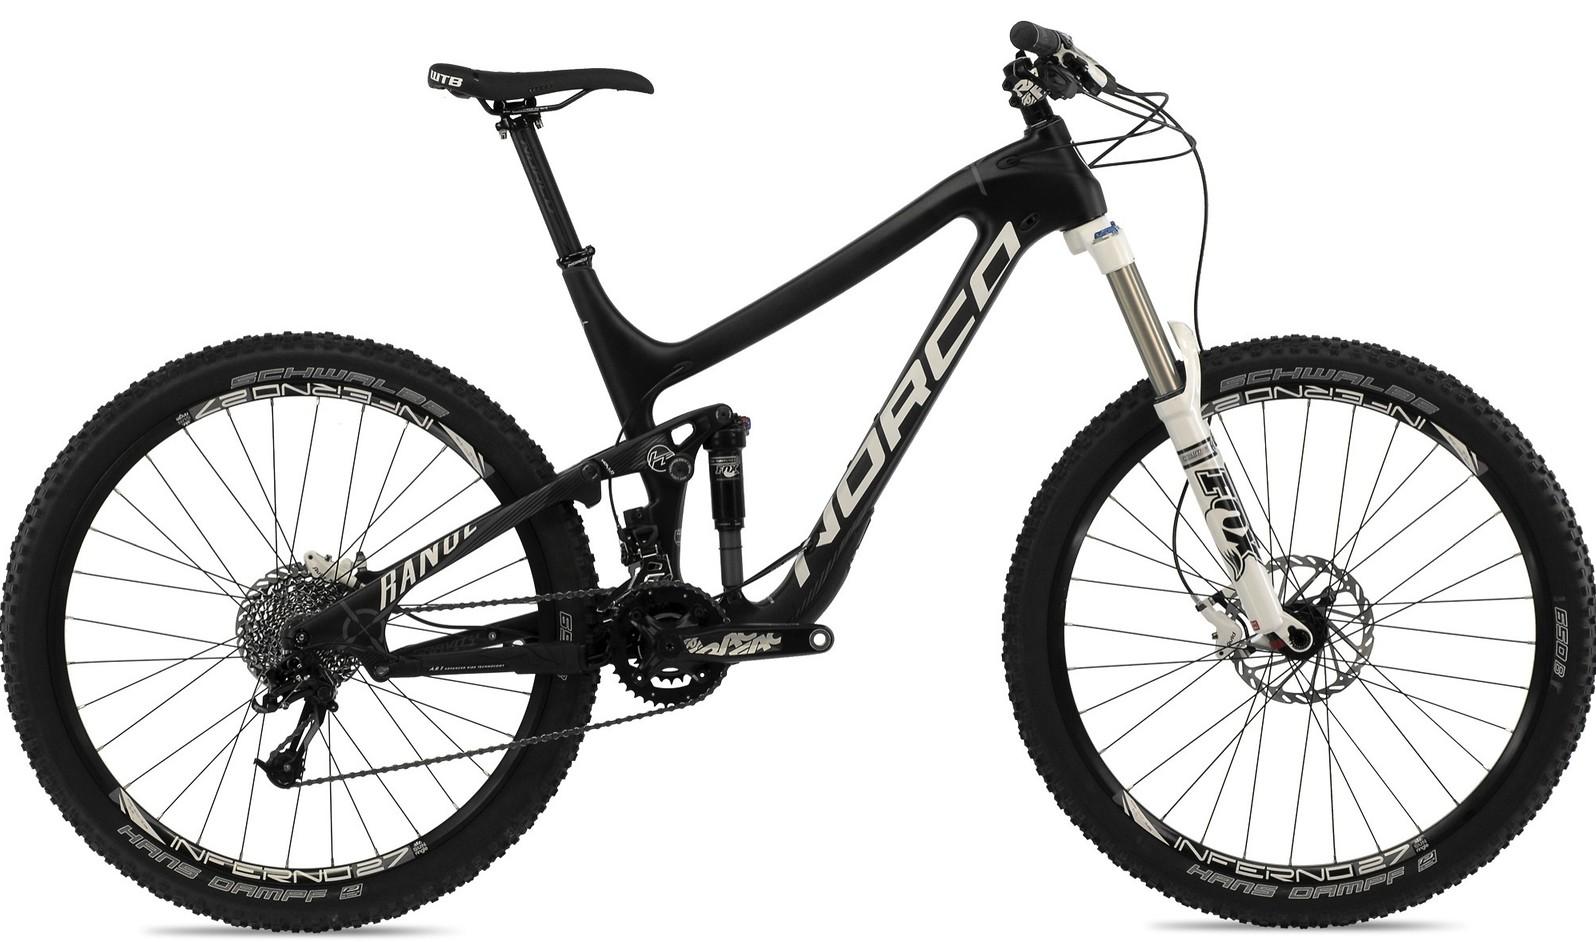 bike - 2014 Norco Range Carbon 7.2